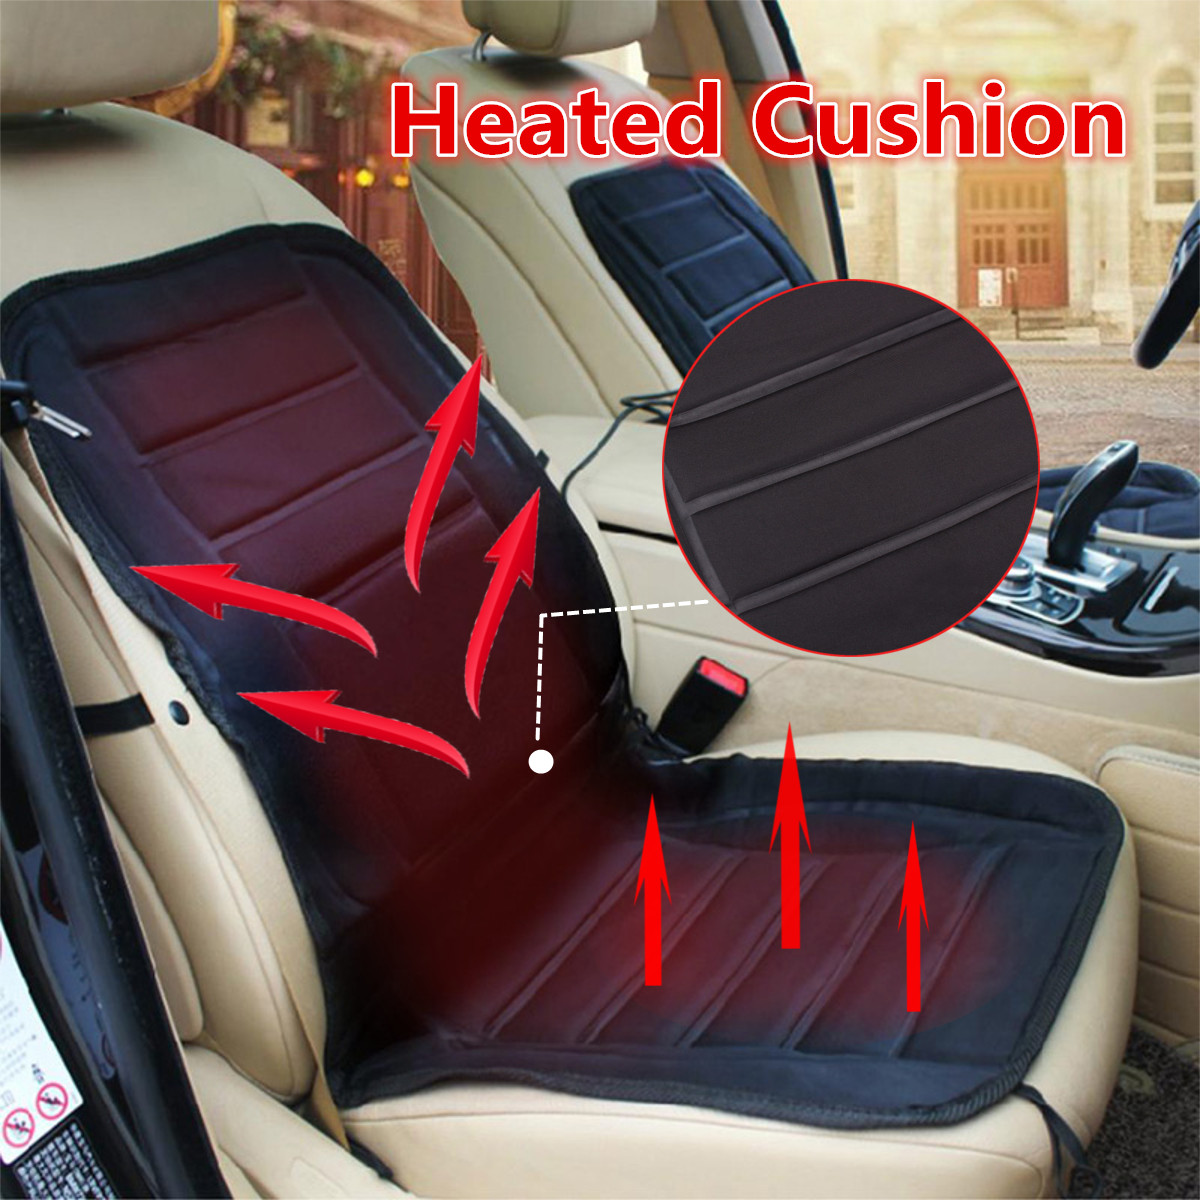 Car Heated Cushion Pad Warmer Winter Universal Seat Hot Heating Heat Cover 30w-45w 30°-60° Cigarette Lighter Adapter Vehicle Auto Van Truck SUV MATCC 12V